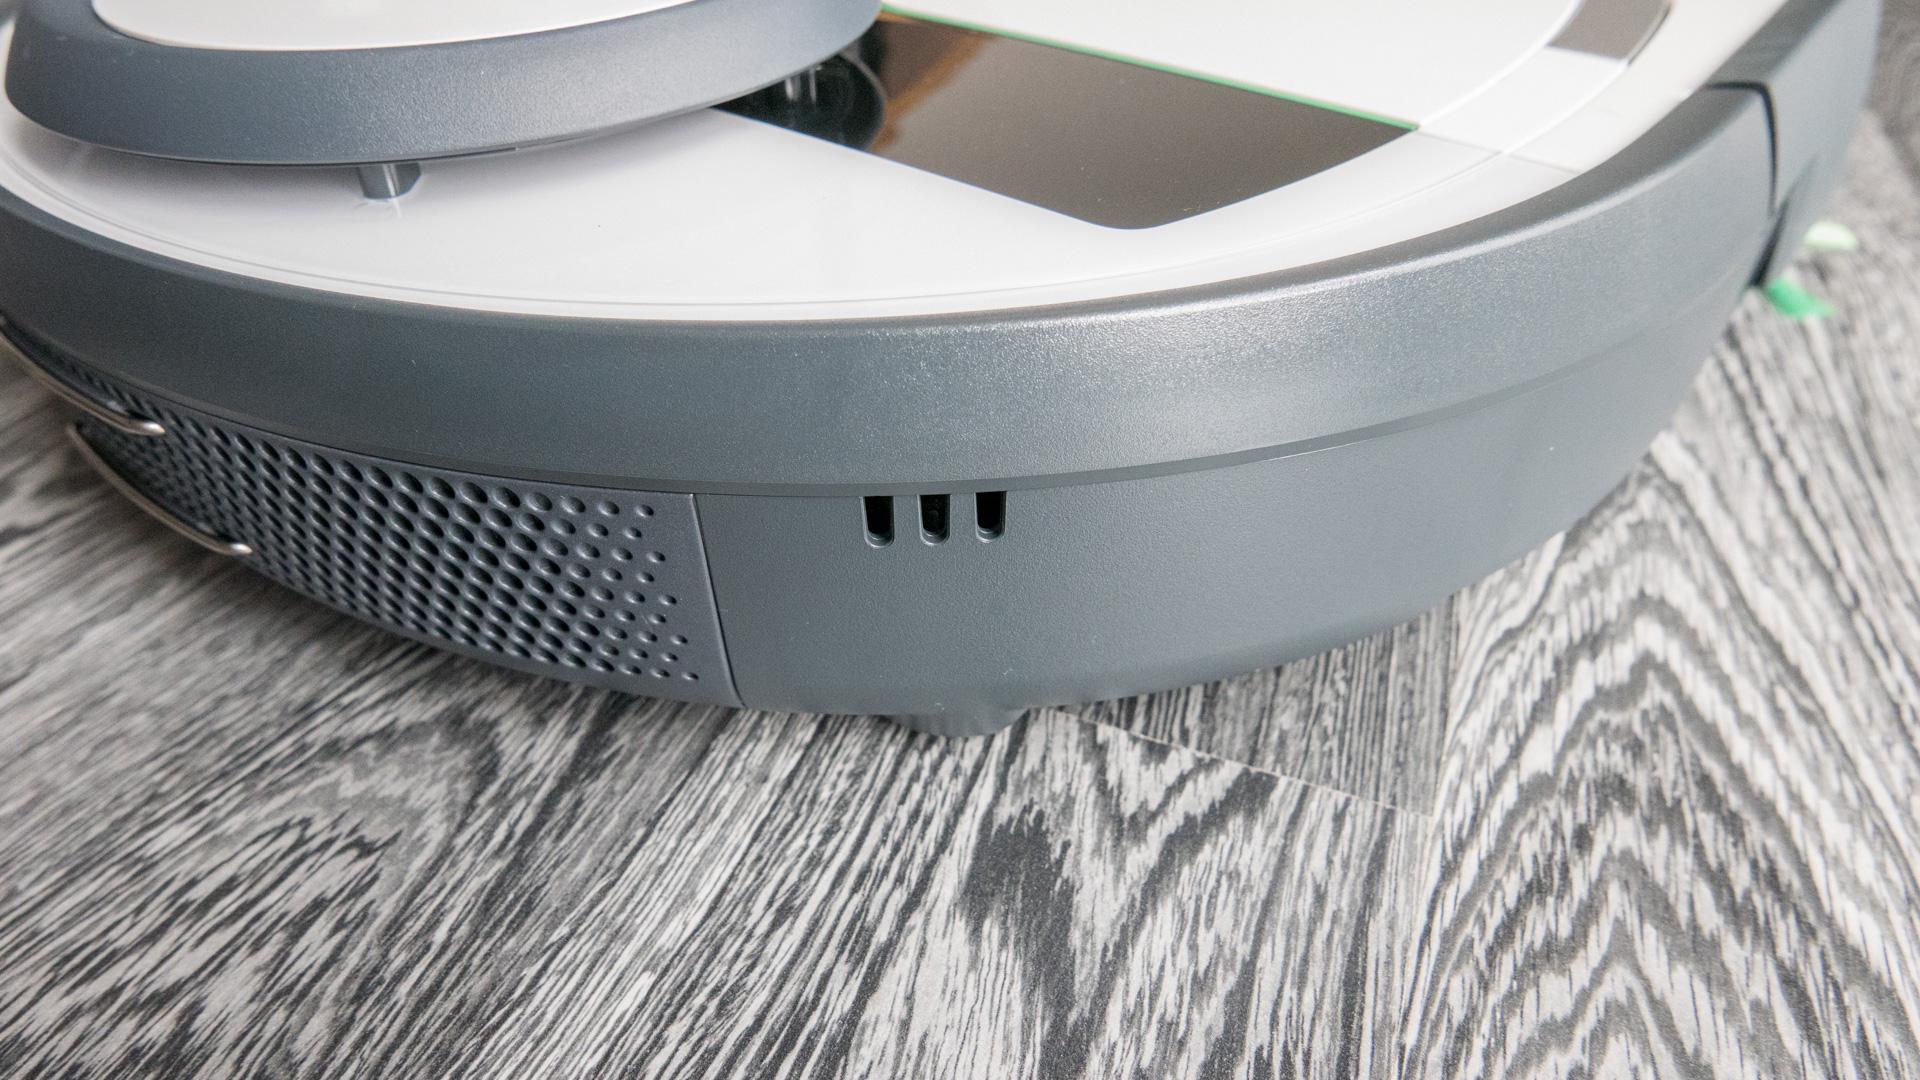 Vorwerk VR200 Details 16